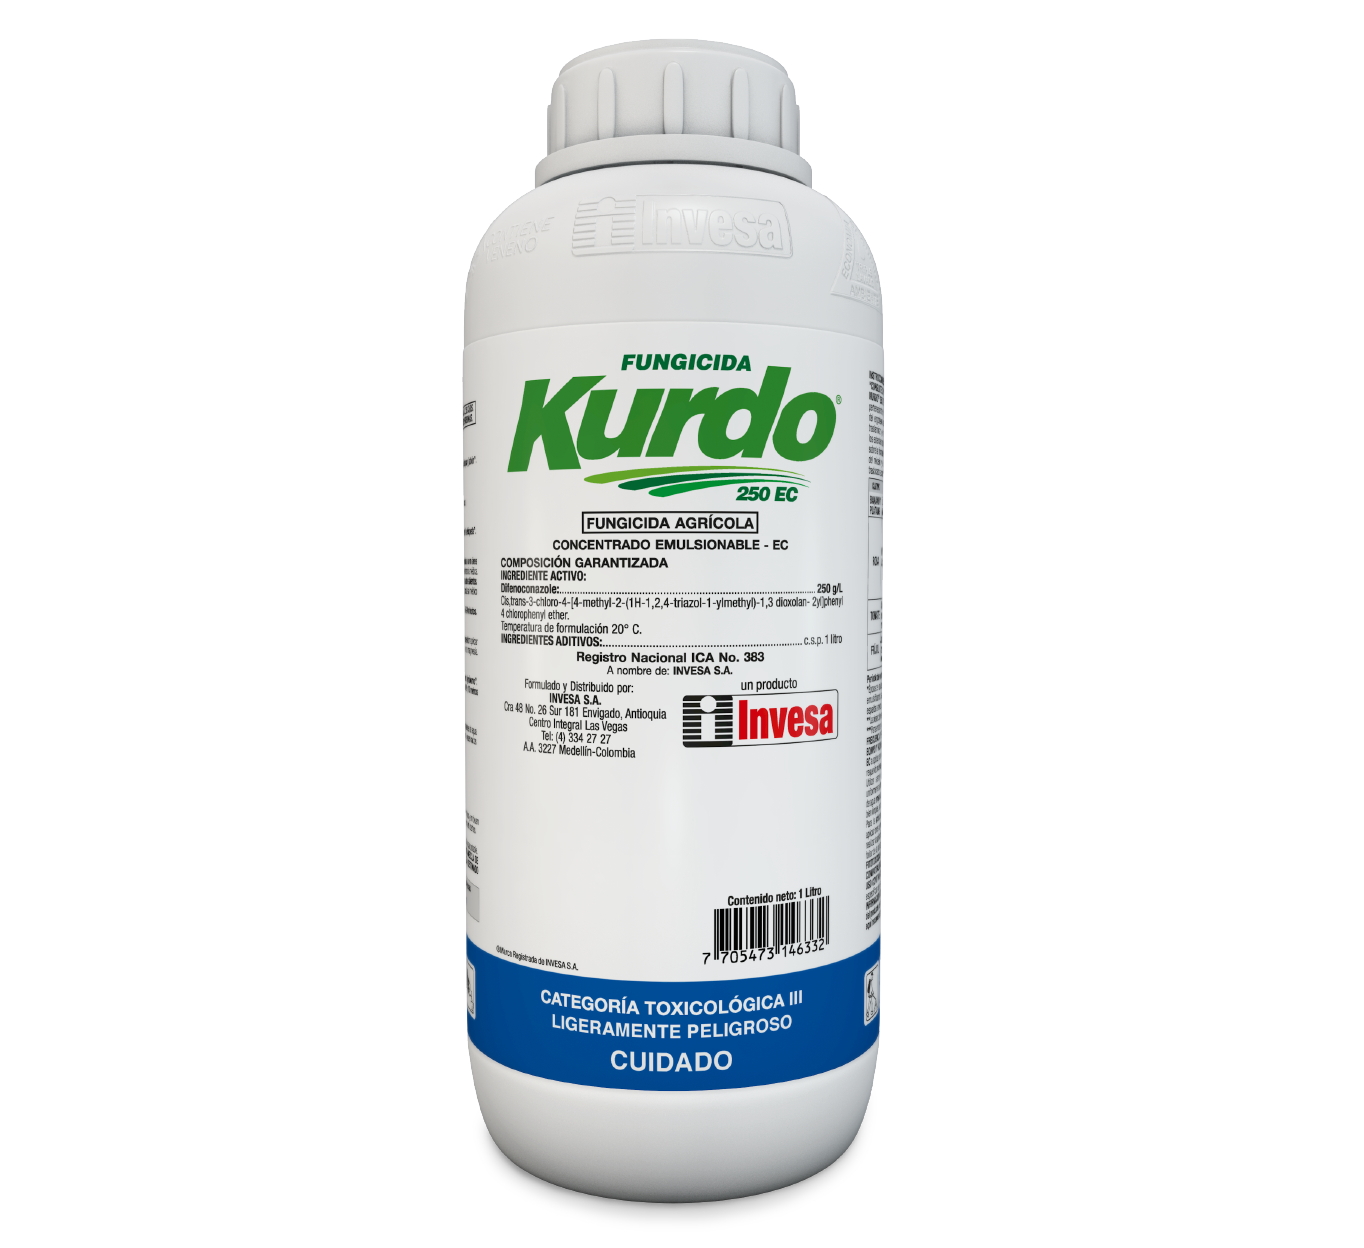 Fungicida kurdo 250 ec invesa 1 litro